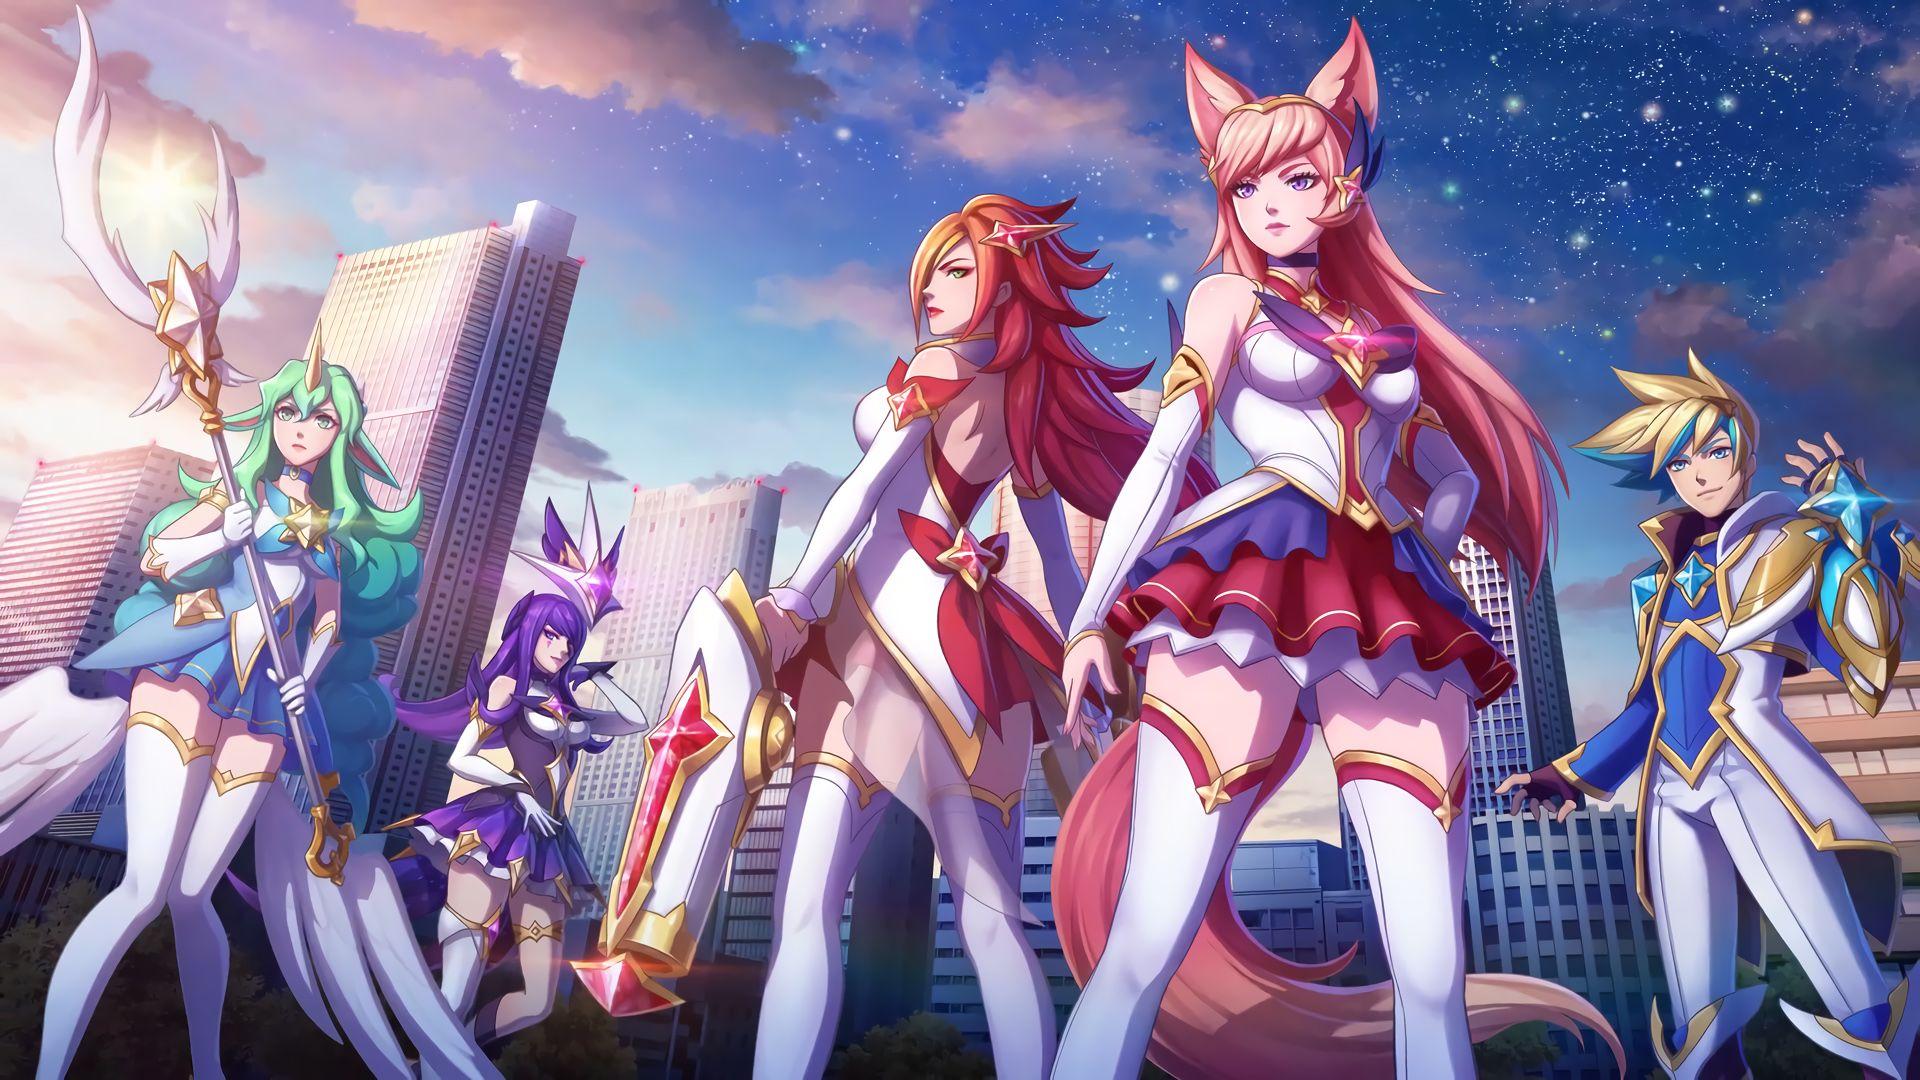 A New Horizon - Star Guardian Ahri, Soraka, Miss Fortune, Ezreal, Syndra  Cinematic (18) HD Wallpaper Background Official Artwork League of Legends  lol